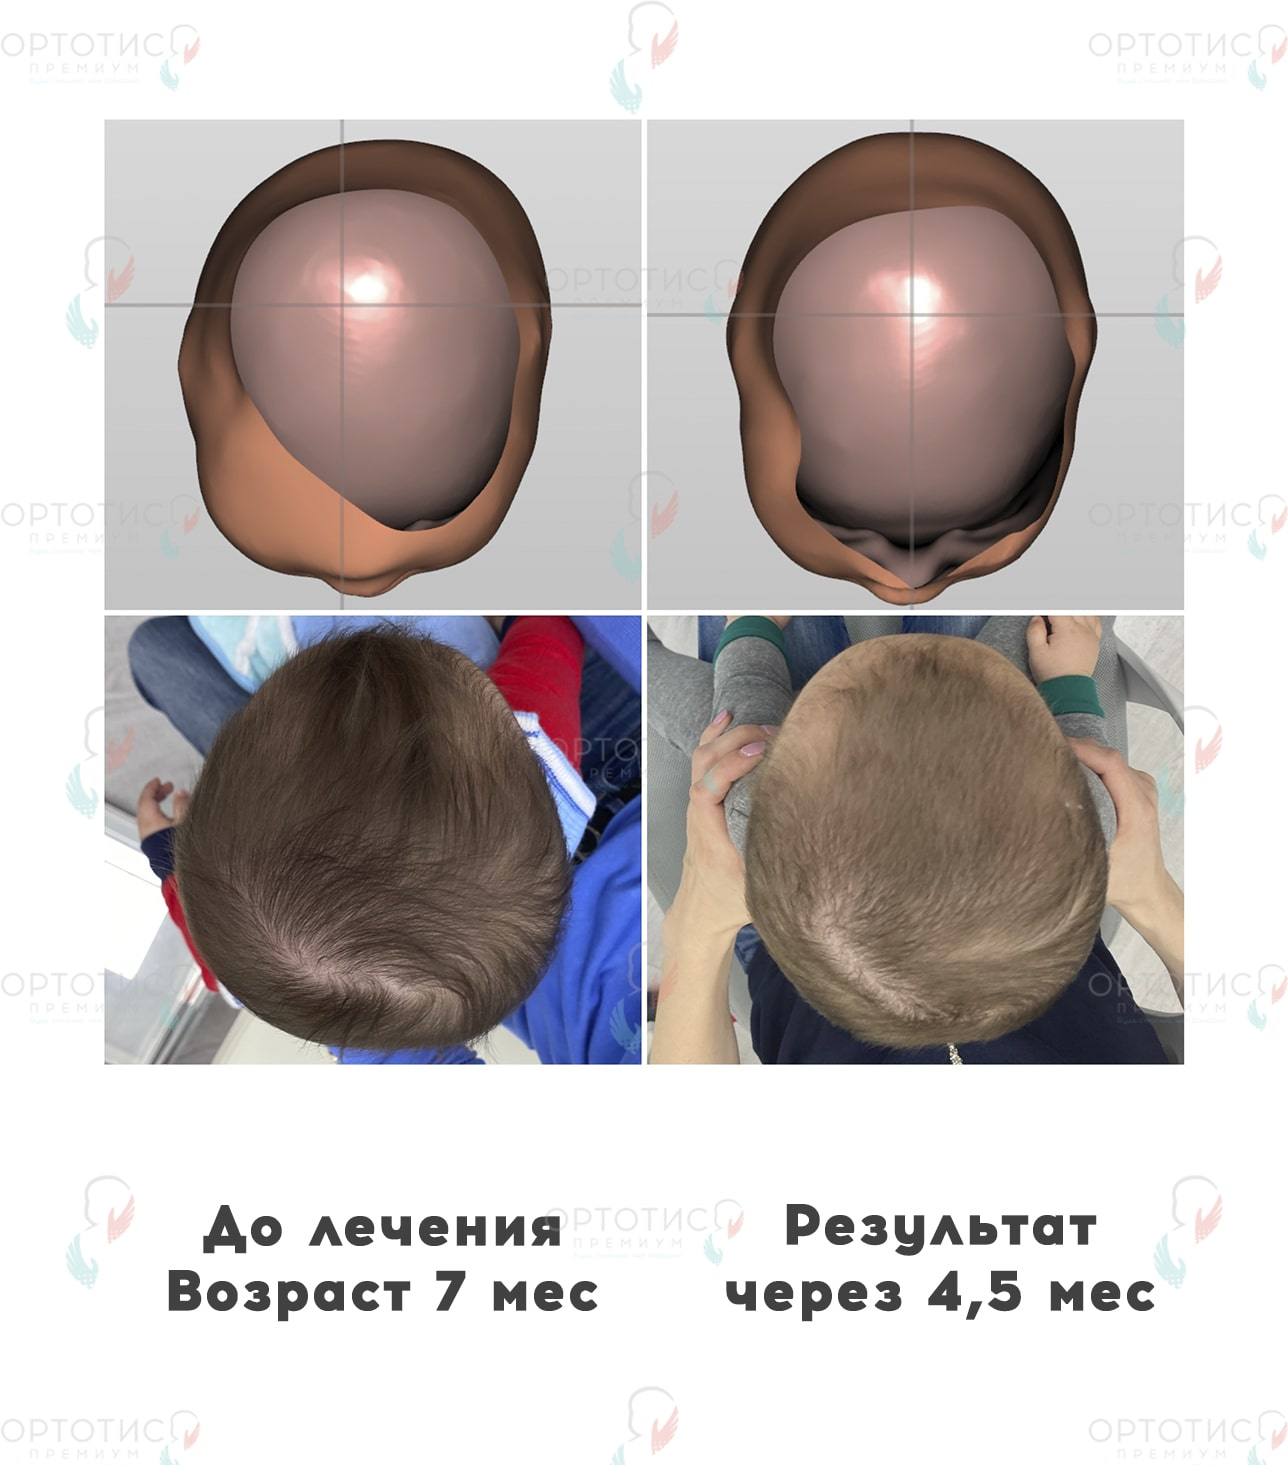 Асимметричная брахицефалия, 4,5 месяцев - Ортотис Премиум